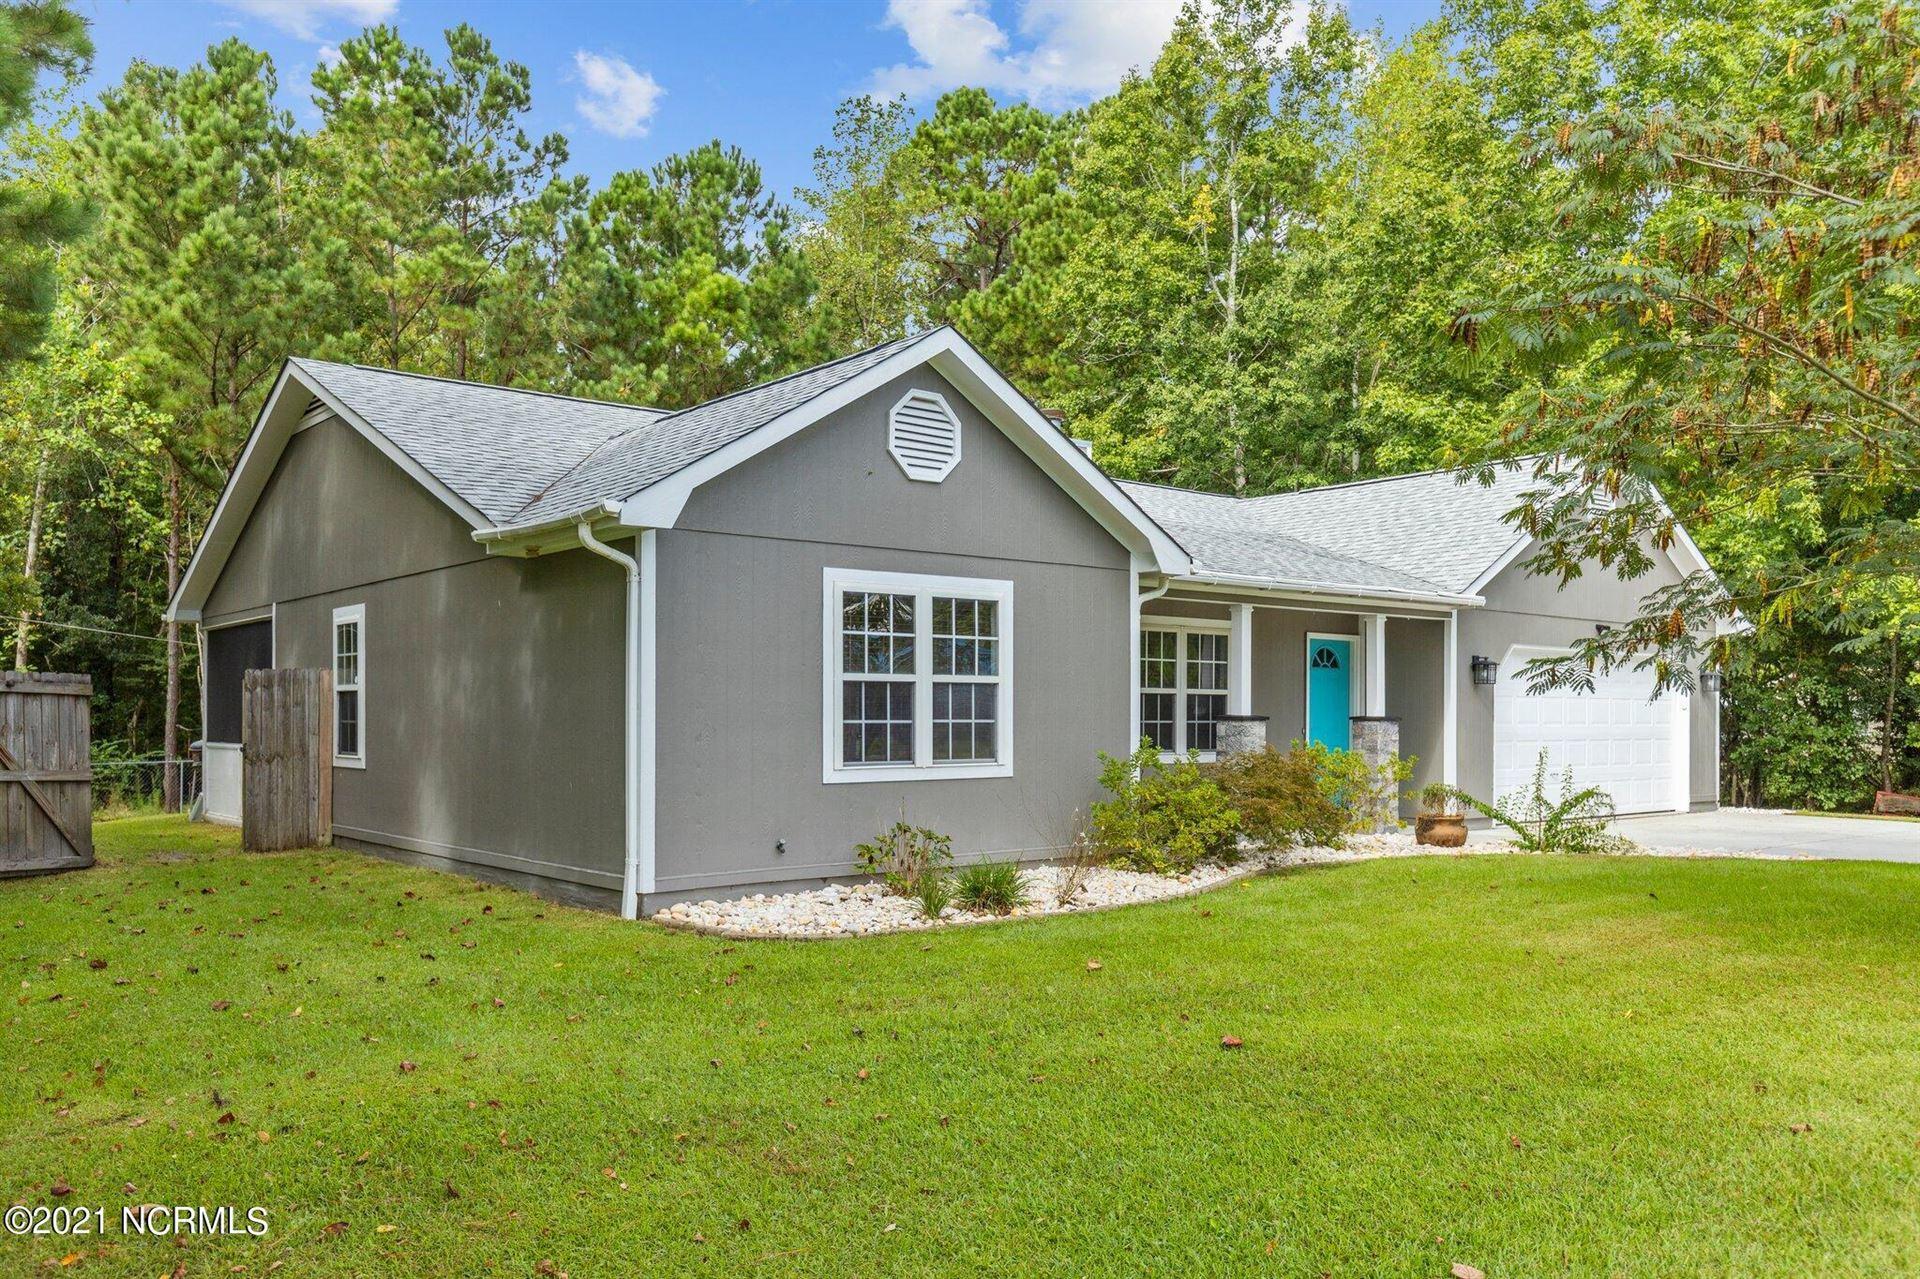 Photo of 208 Glenwood Drive, Hubert, NC 28539 (MLS # 100285641)